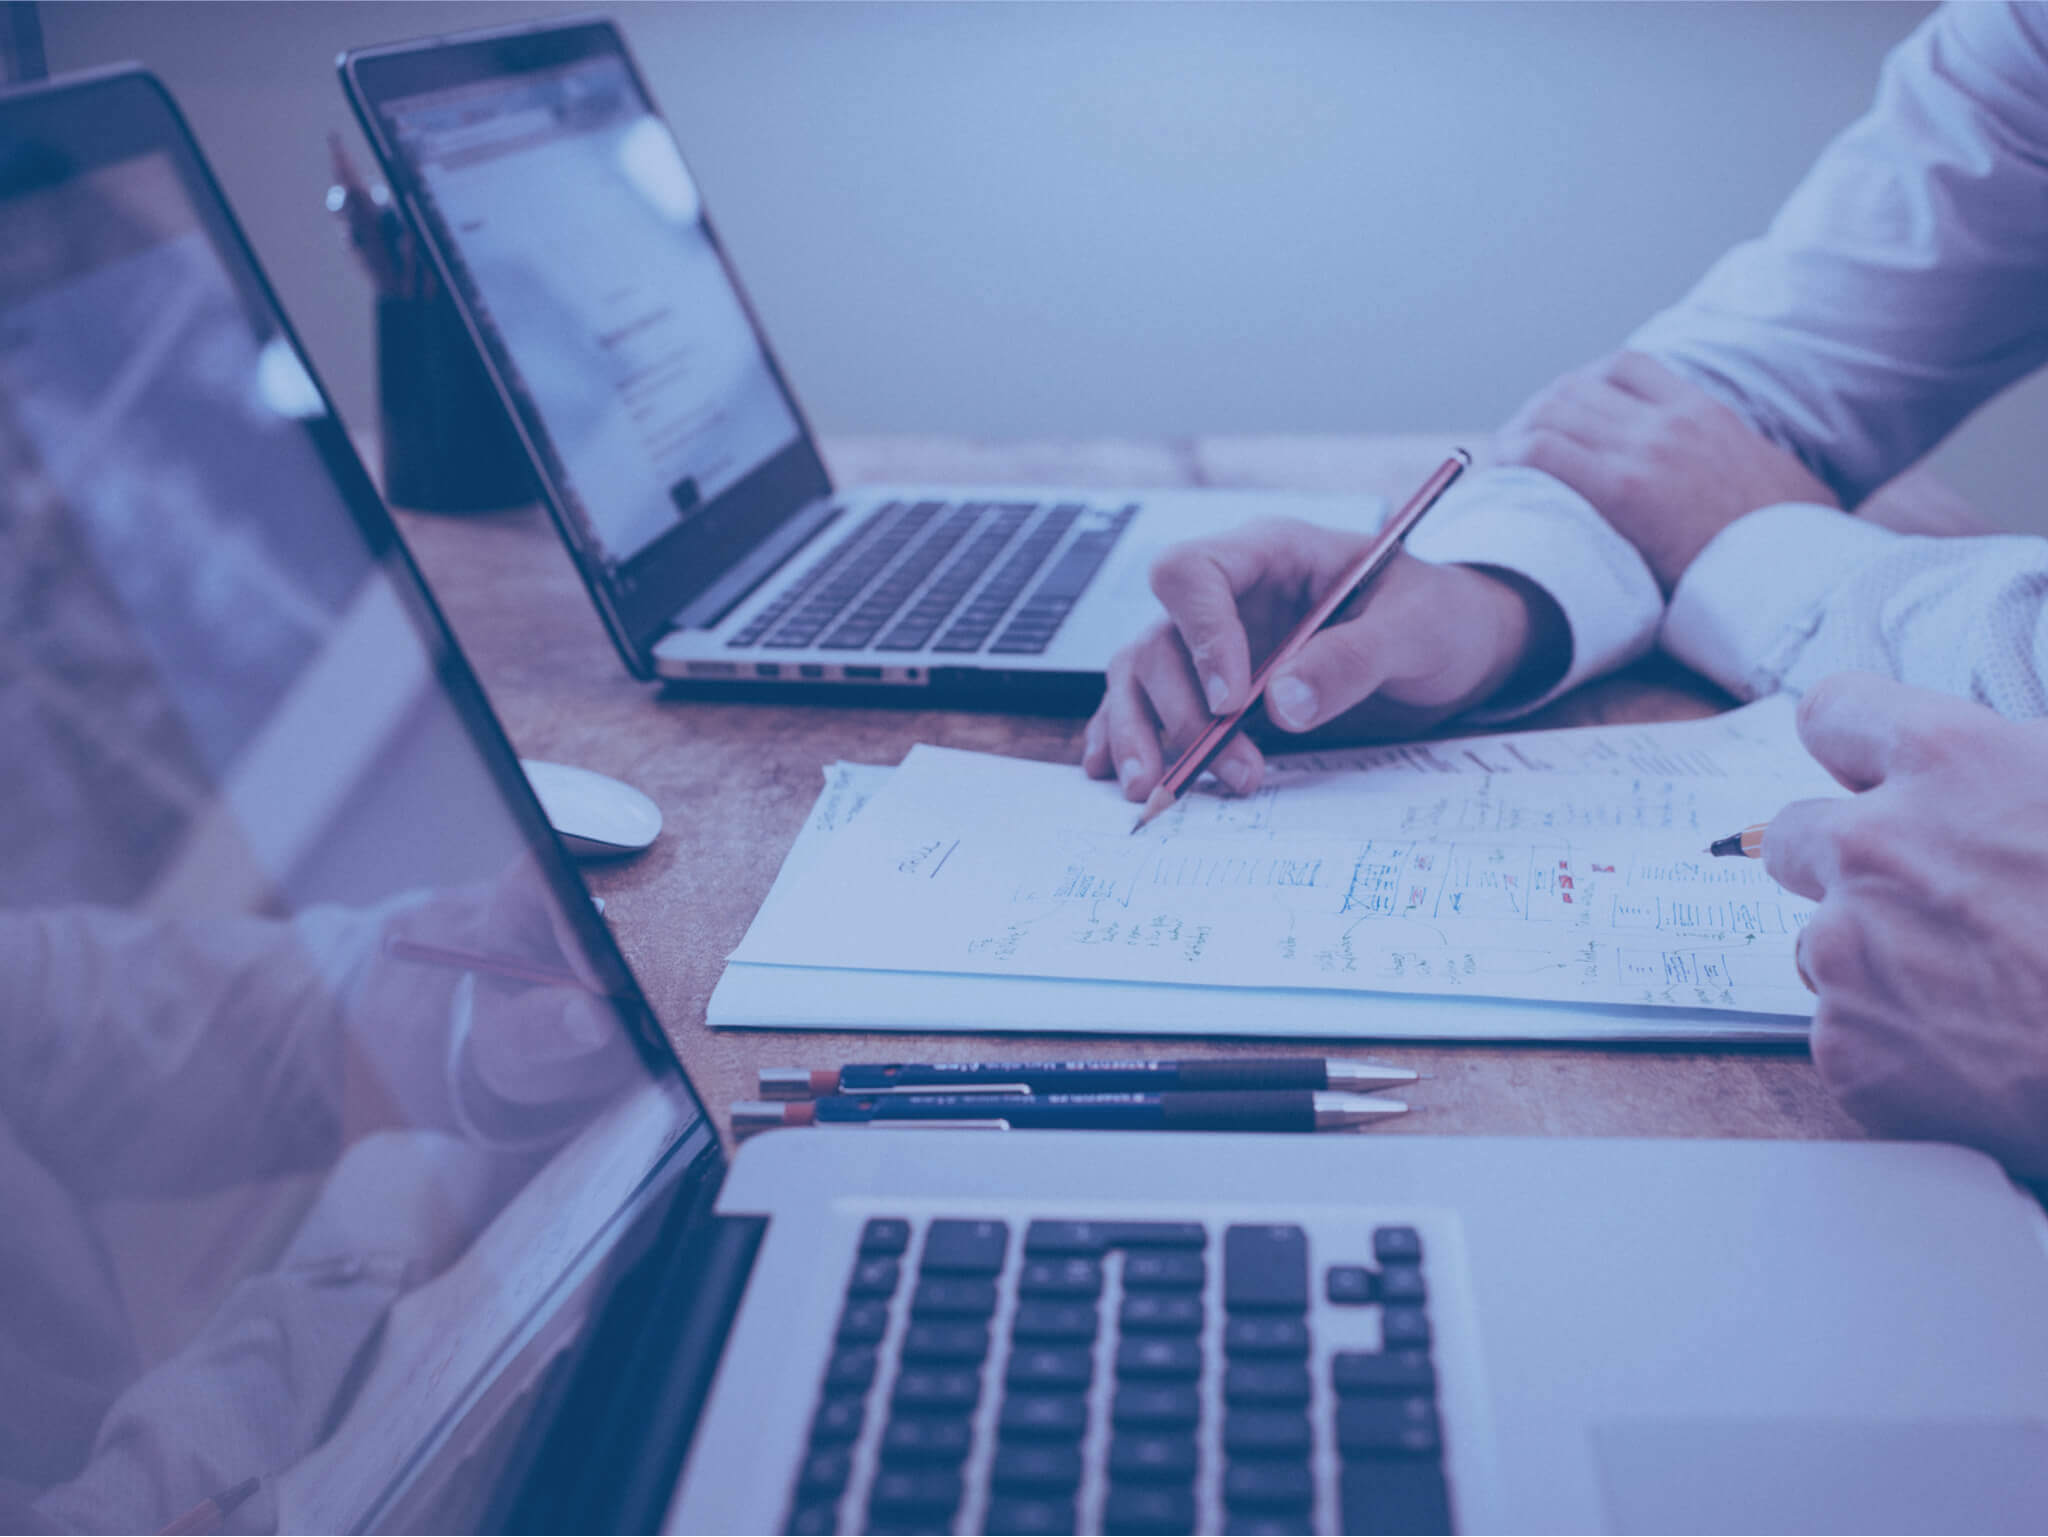 Application Management for Today's Enterprises